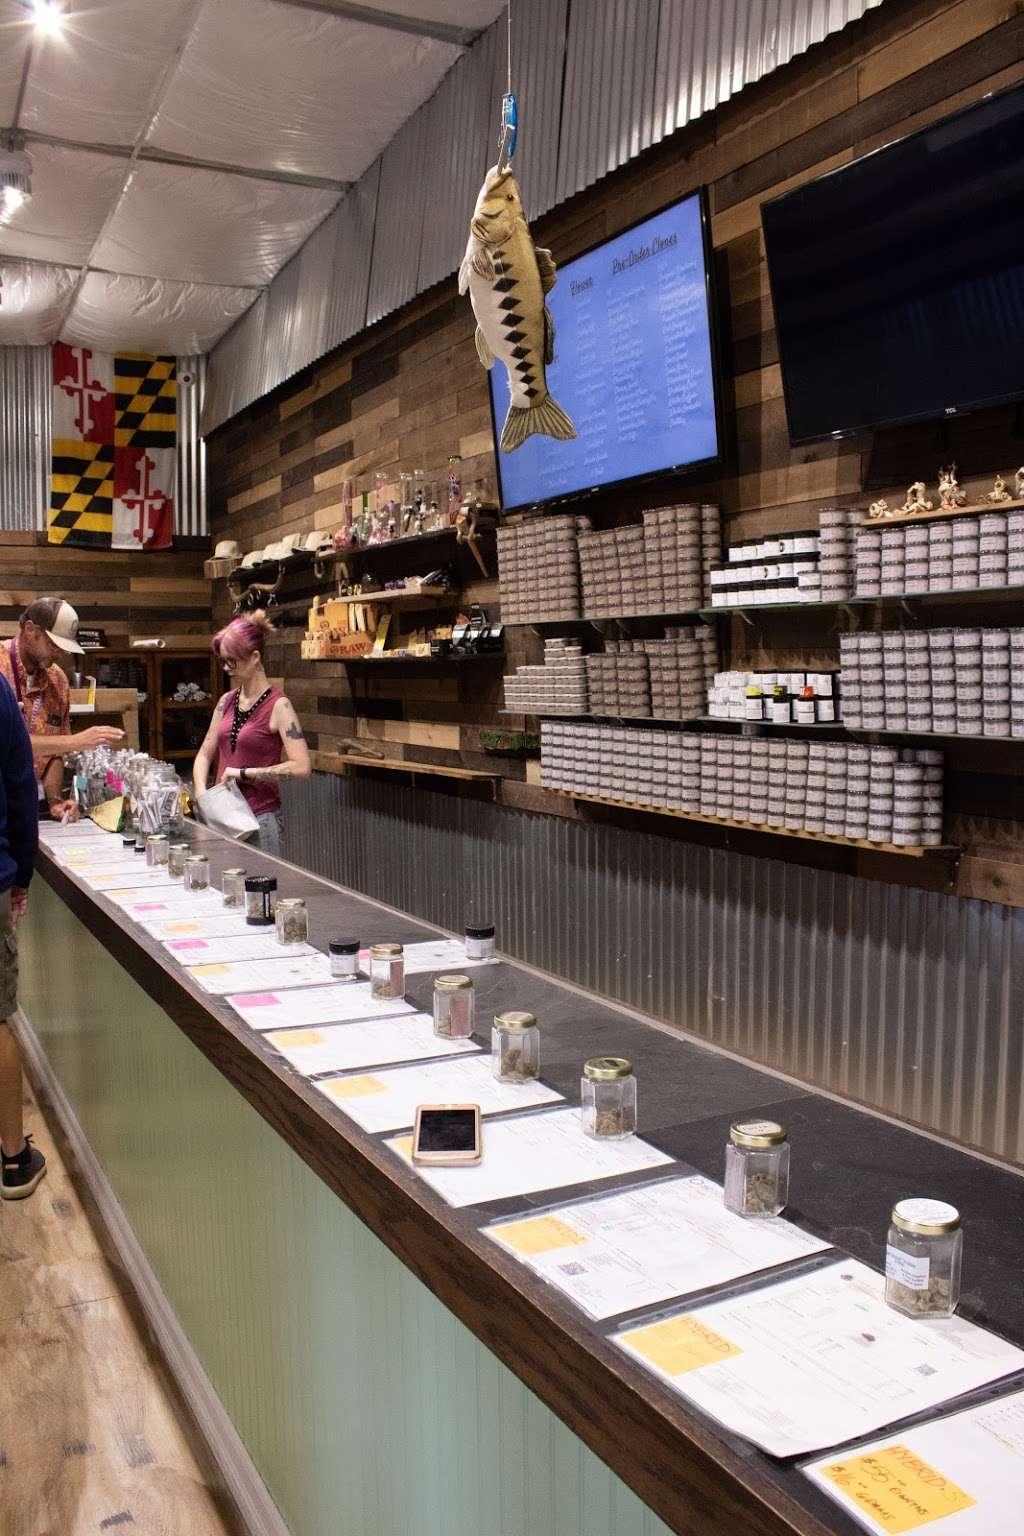 Rio Vista Farms - store  | Photo 4 of 10 | Address: 11 Richard Brann Drive, Rio Vista, CA 94571, USA | Phone: (833) 424-4283